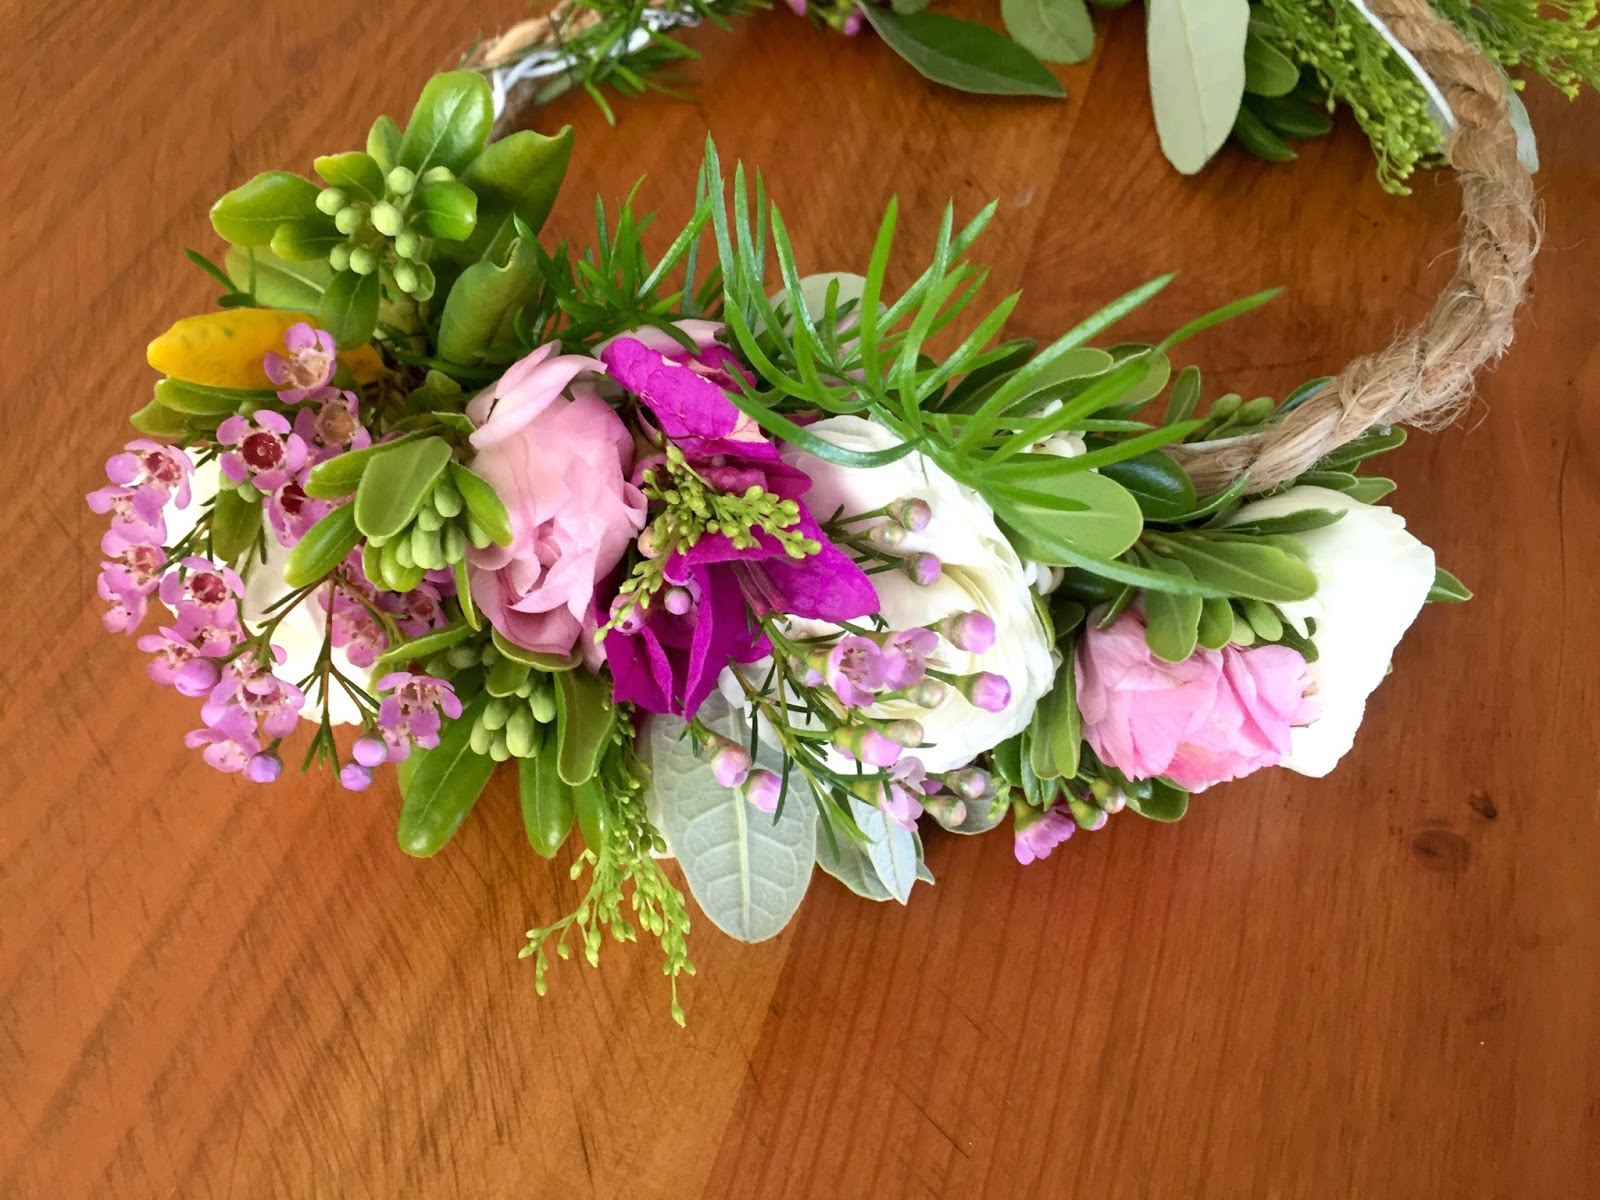 D D s Cottage and Design Fresh Flower Crowns